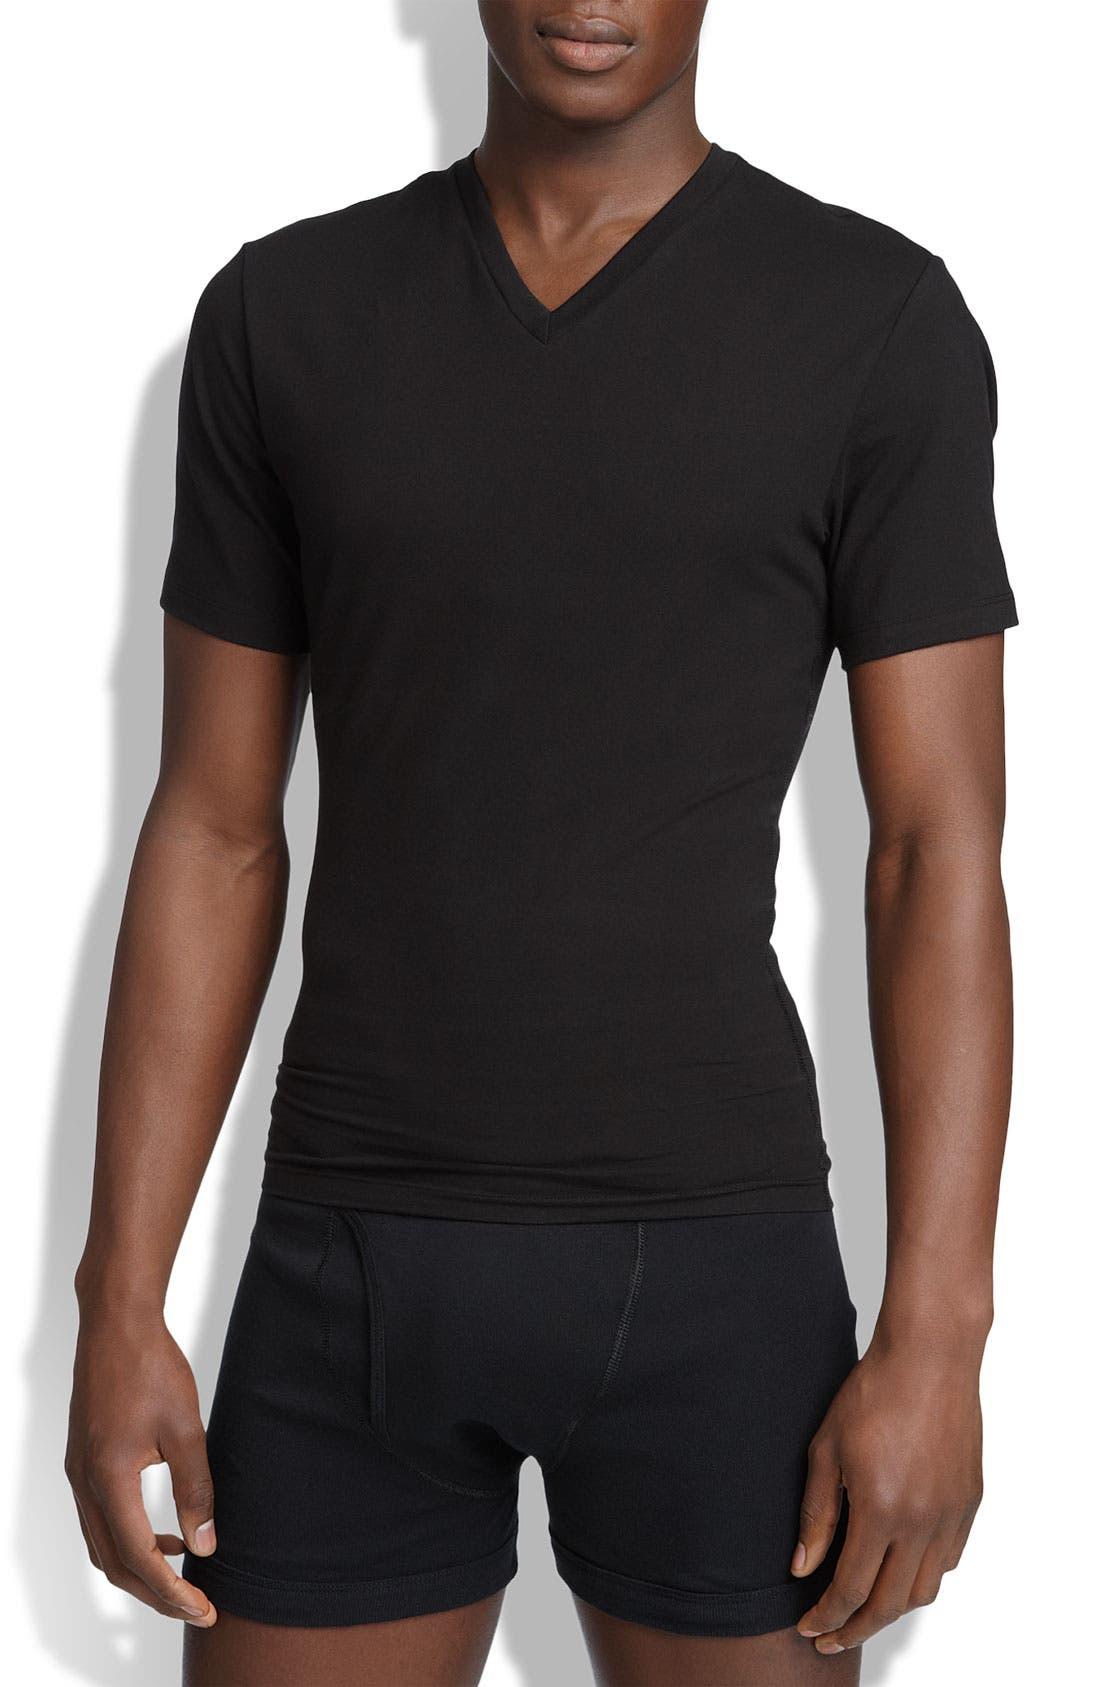 SPANX® V-Neck Cotton Compression T-Shirt